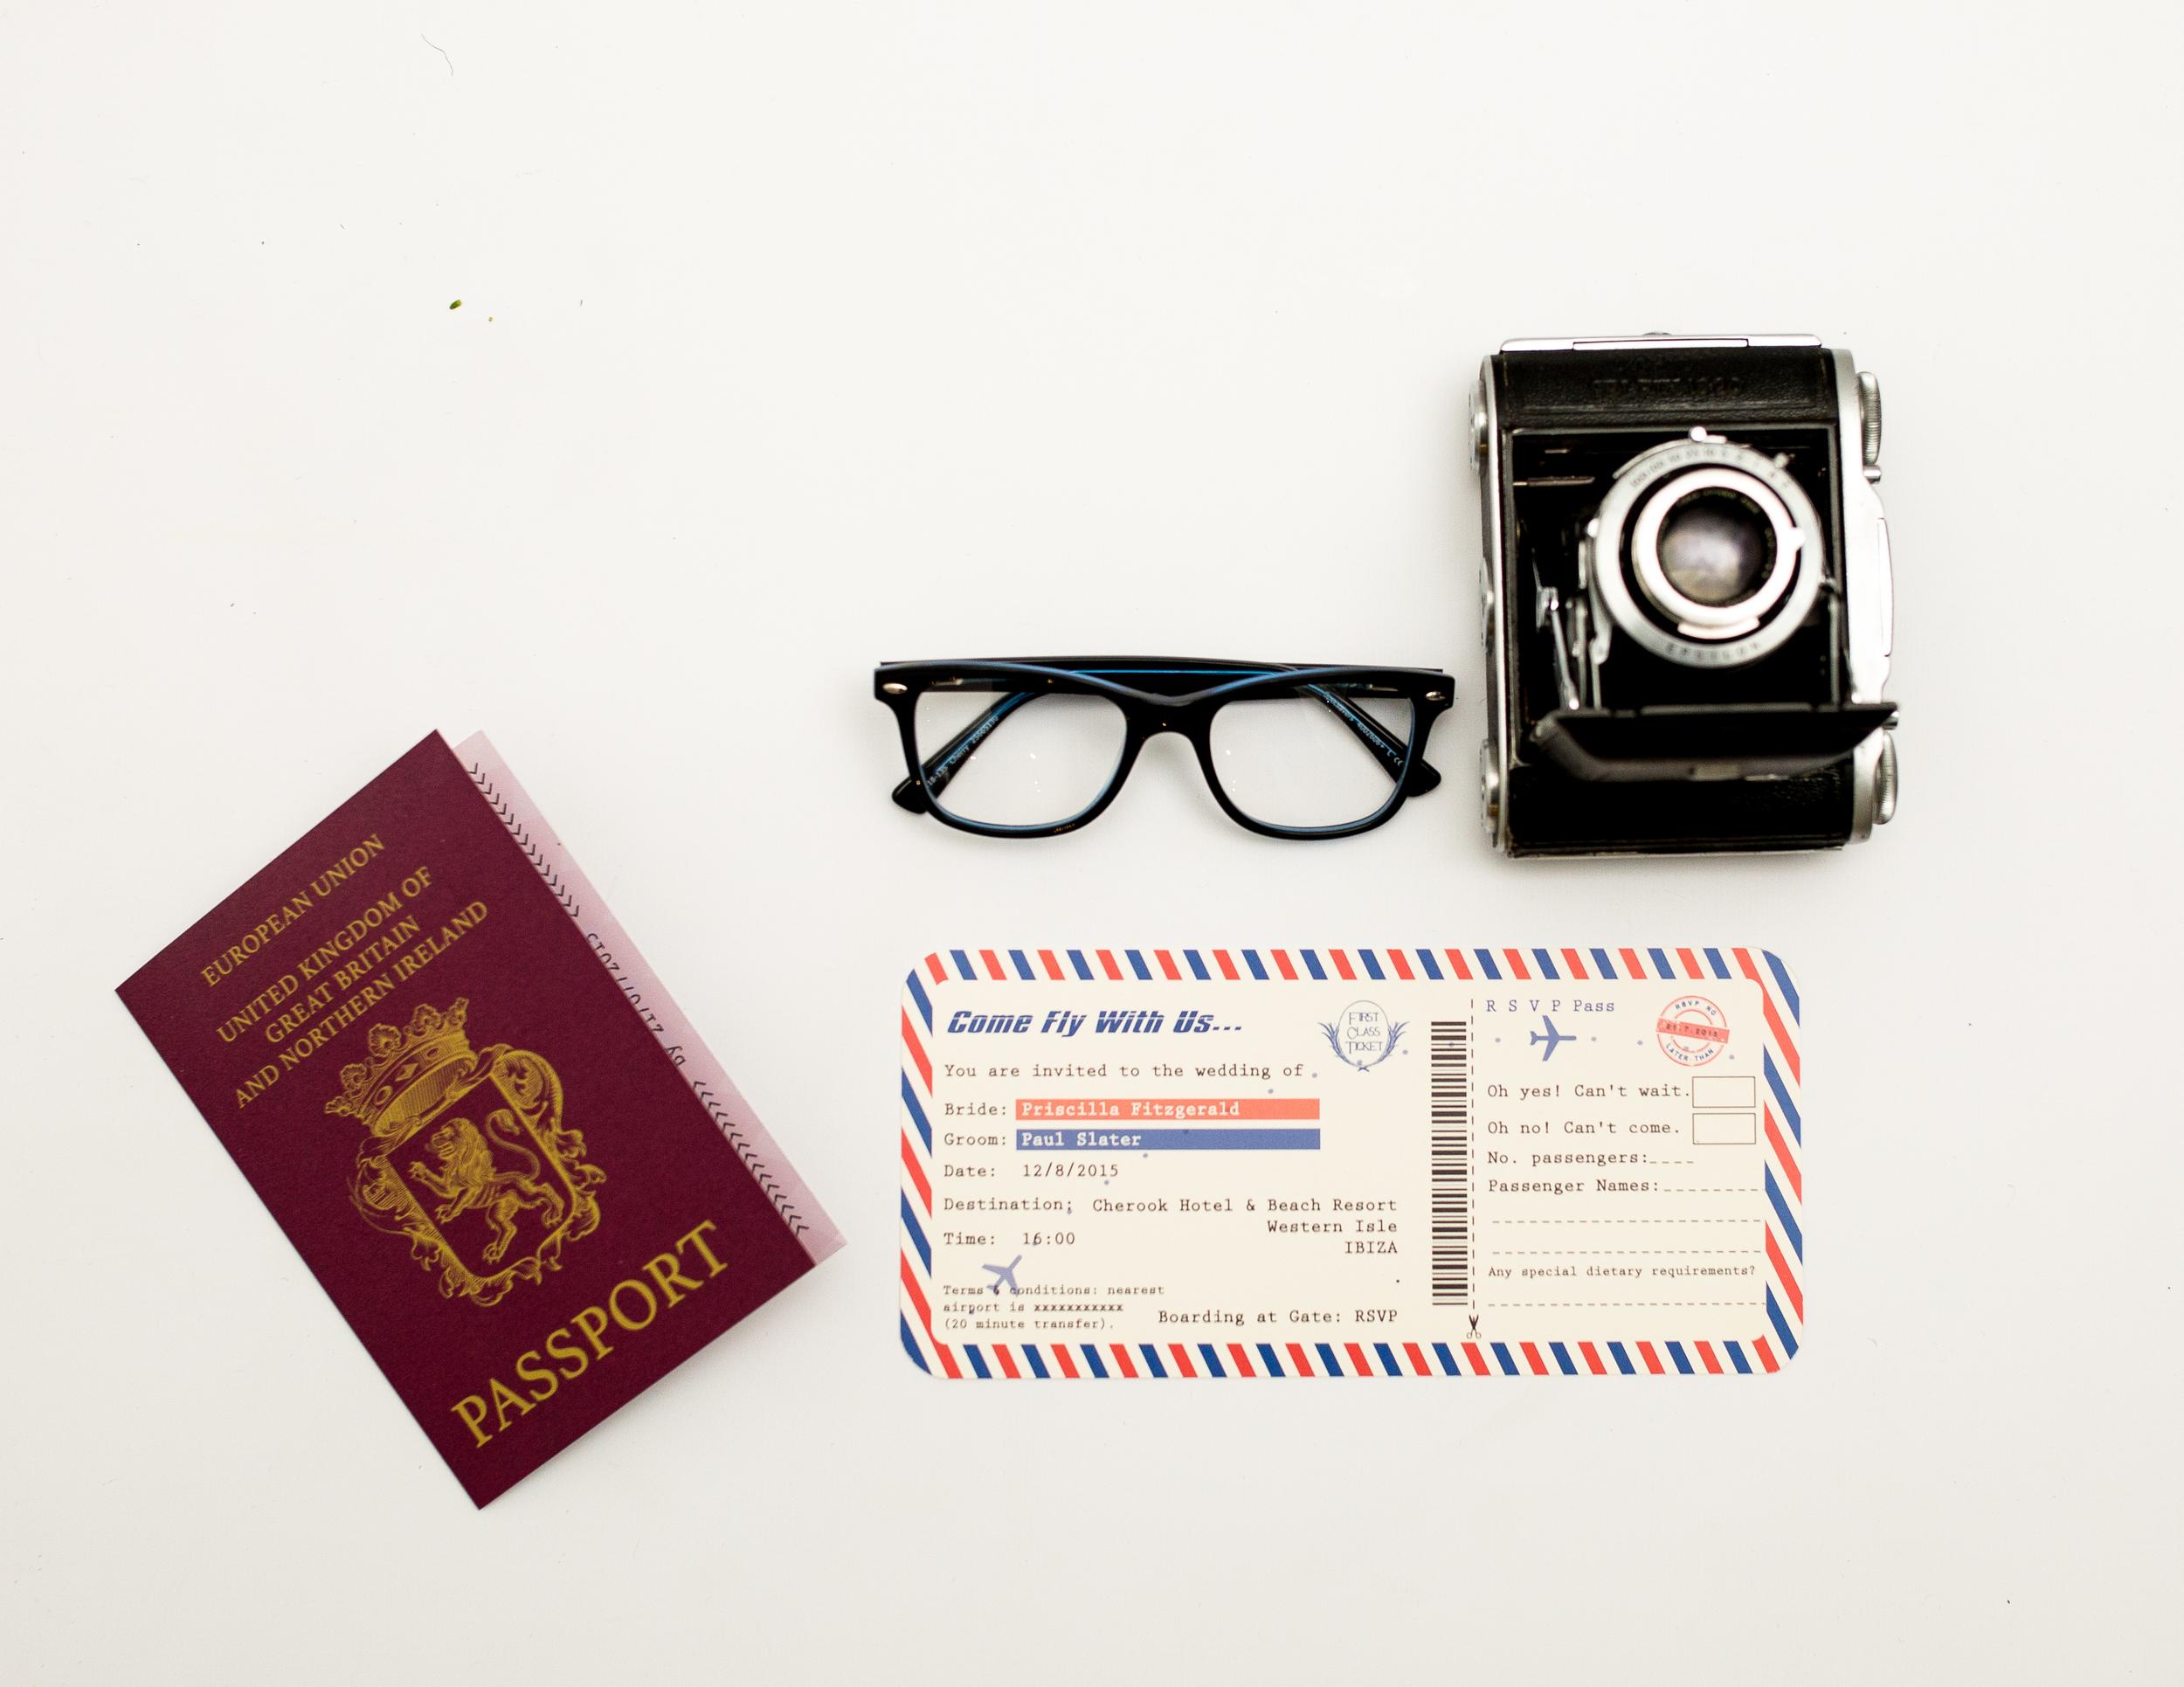 Destination Wedding Passport Invitation + Boarding Pass Invitation RSVP Combined Front